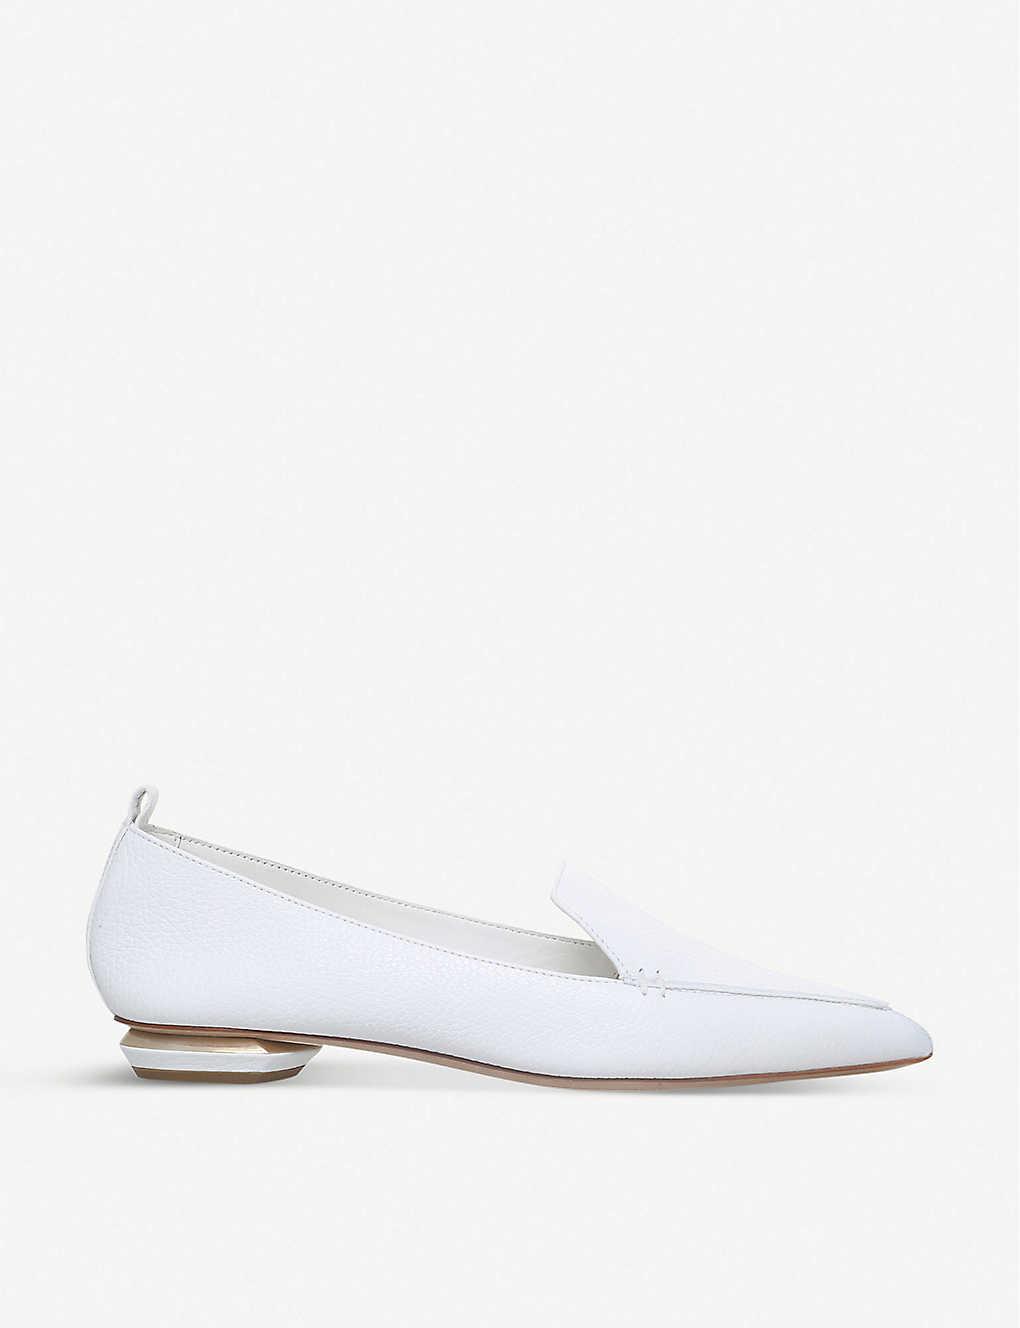 25033349f0f9 NICHOLAS KIRKWOOD - Beya grained-leather loafers